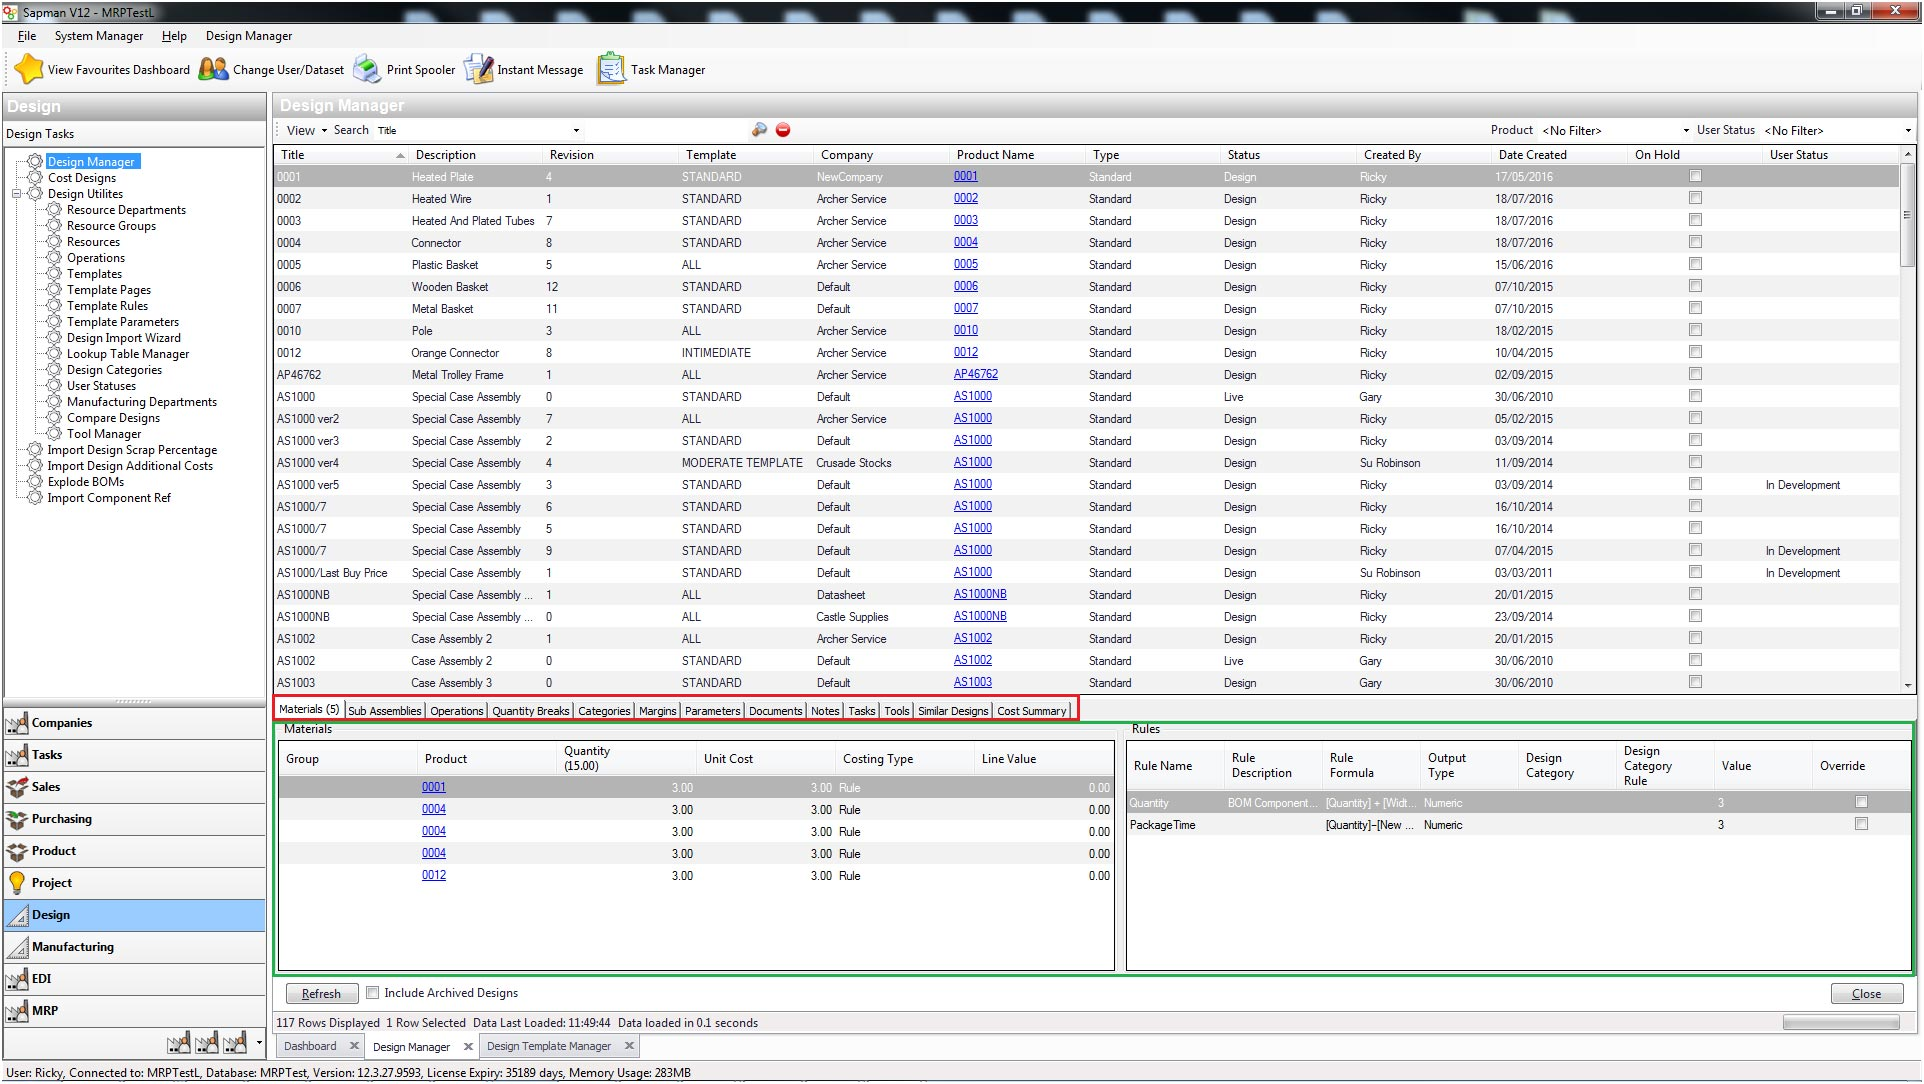 Sapman v12 Design Manager screen